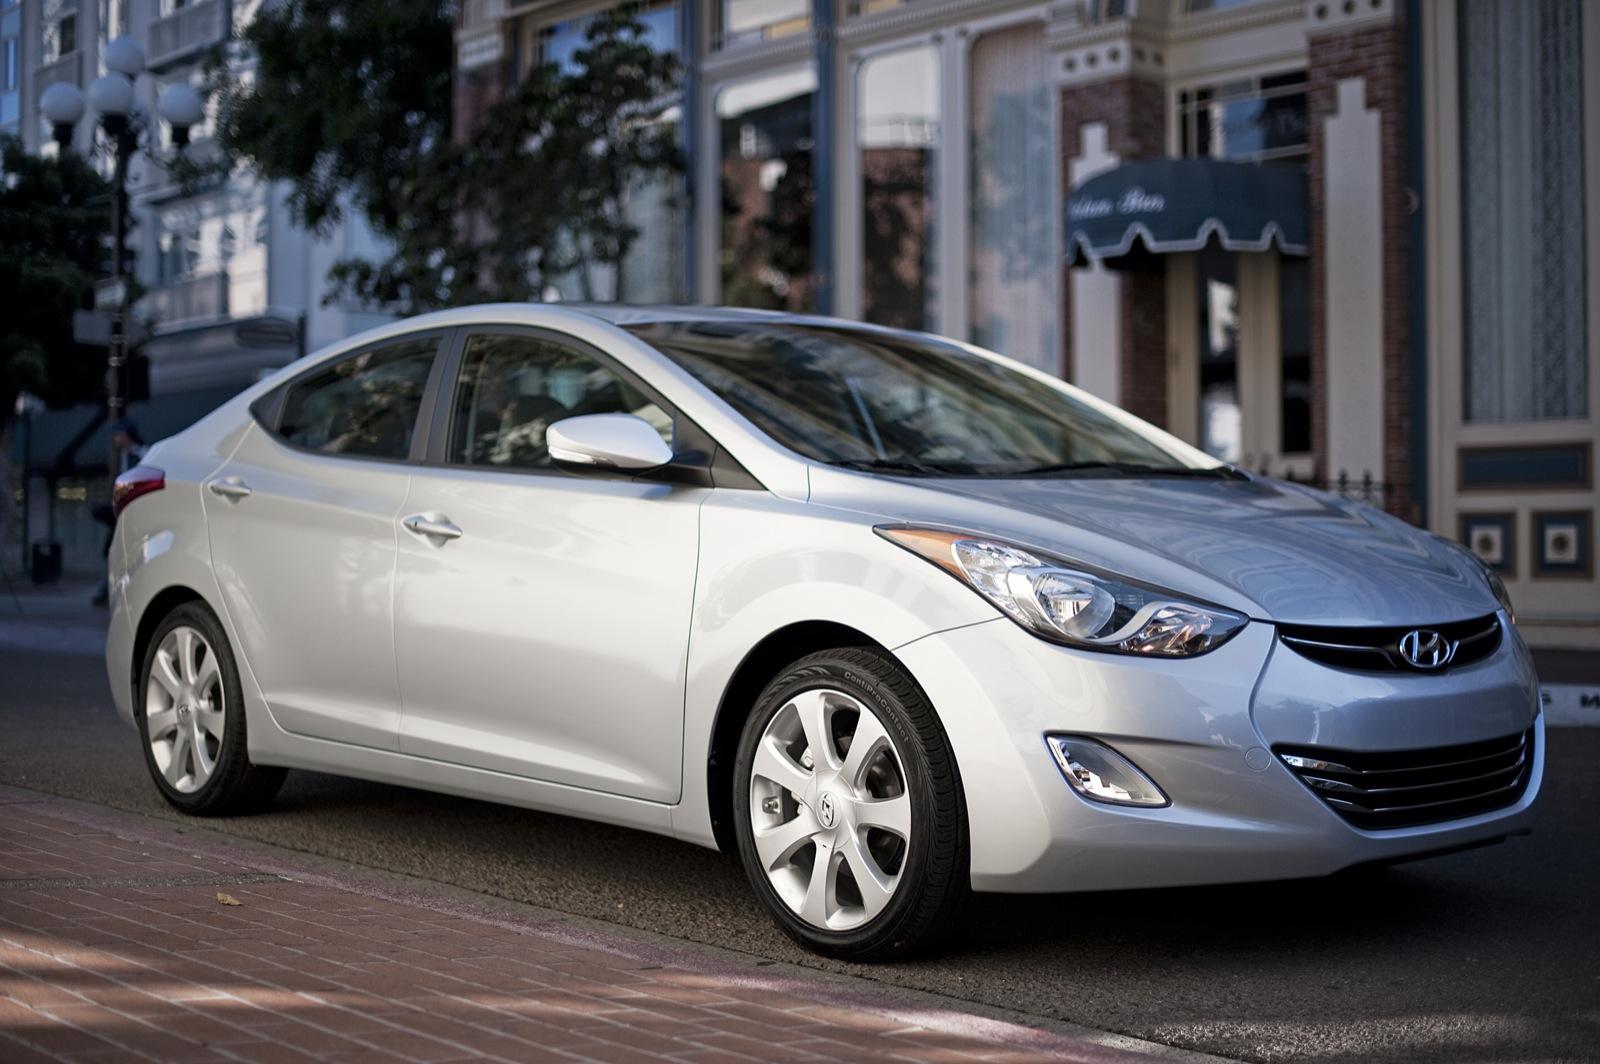 2011 Hyundai Elantra: Now With Rear-Seat Heaters